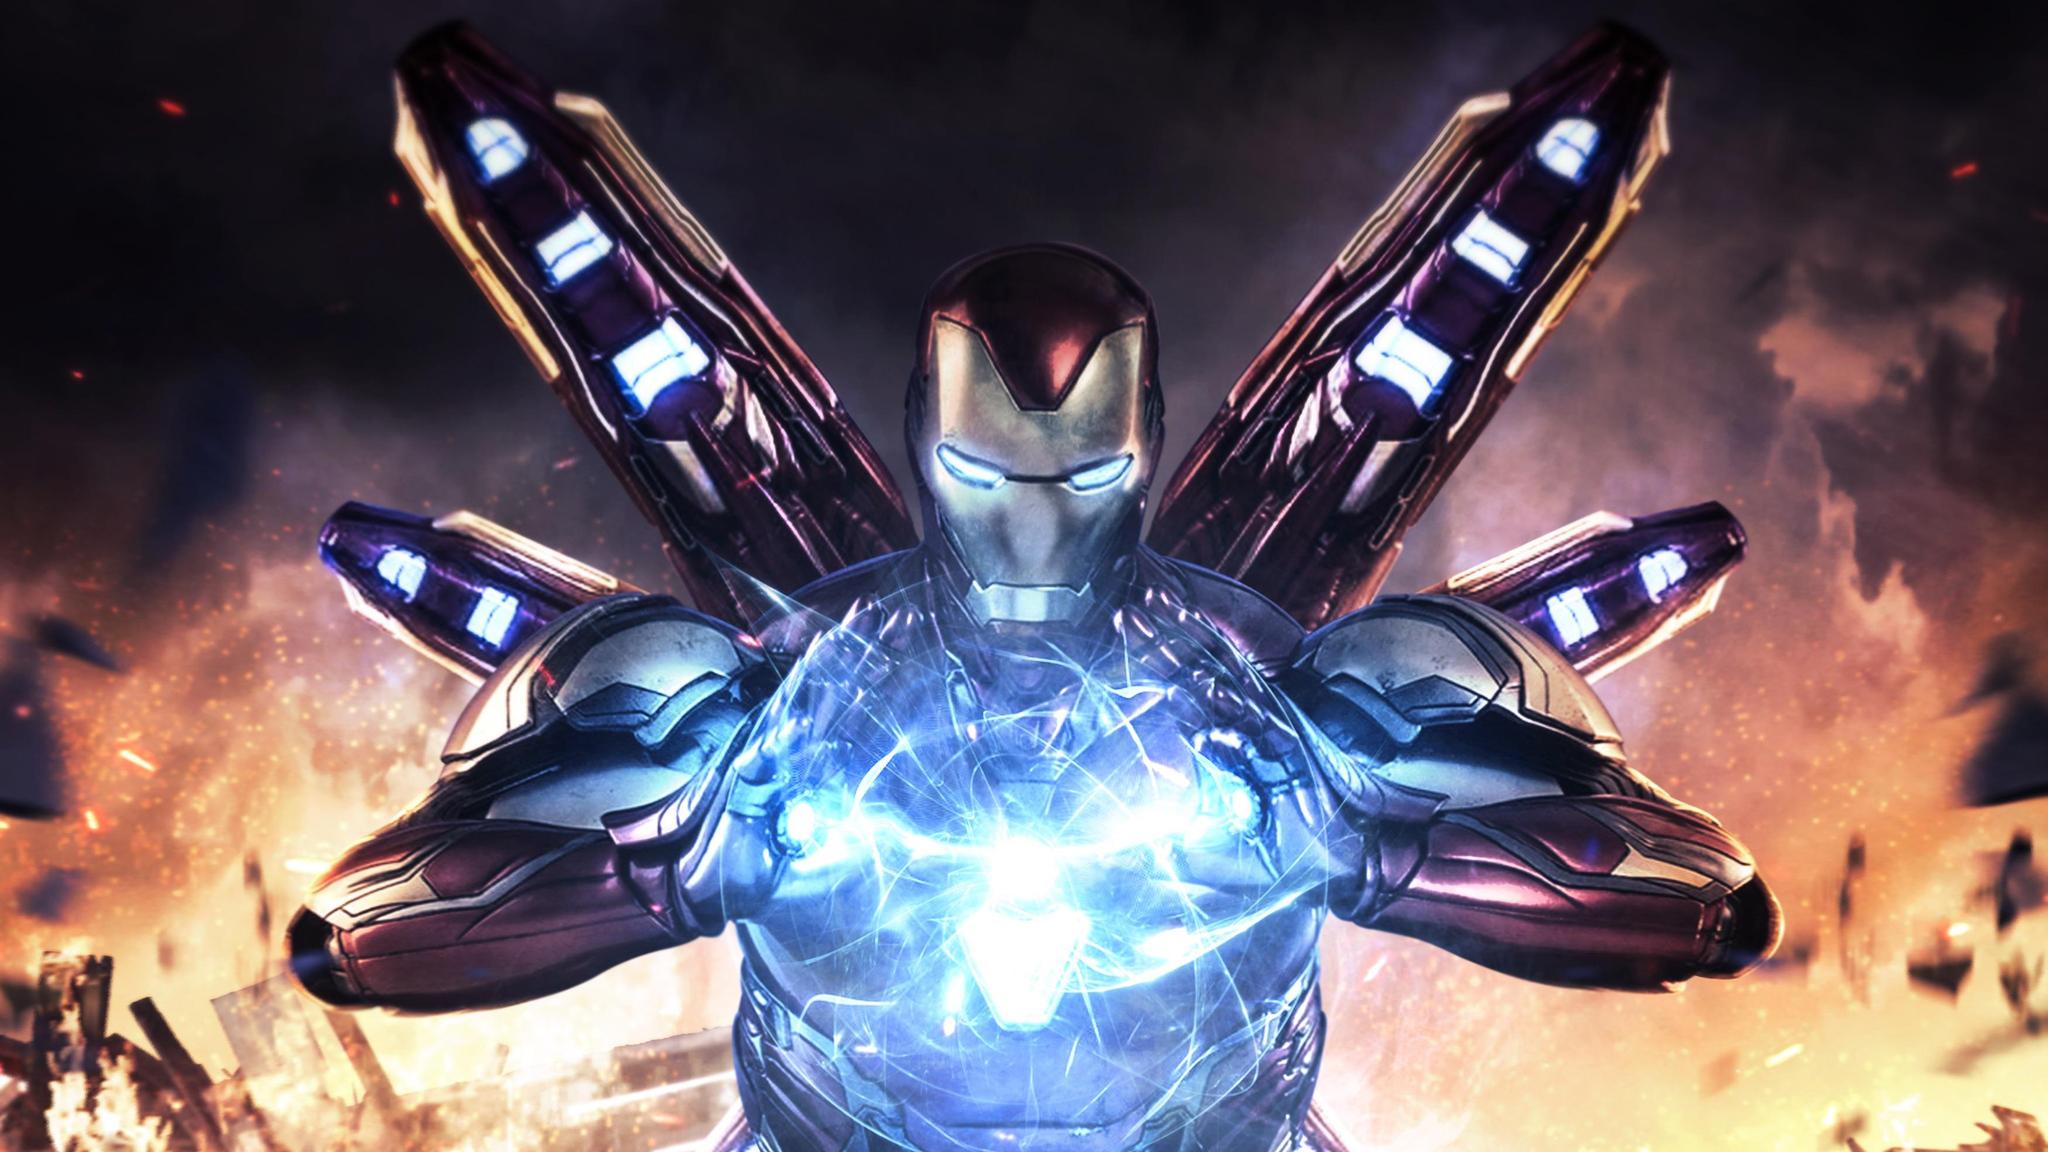 2048x1152 Iron Man Avengers Endgame 4k 2048x1152 Resolution